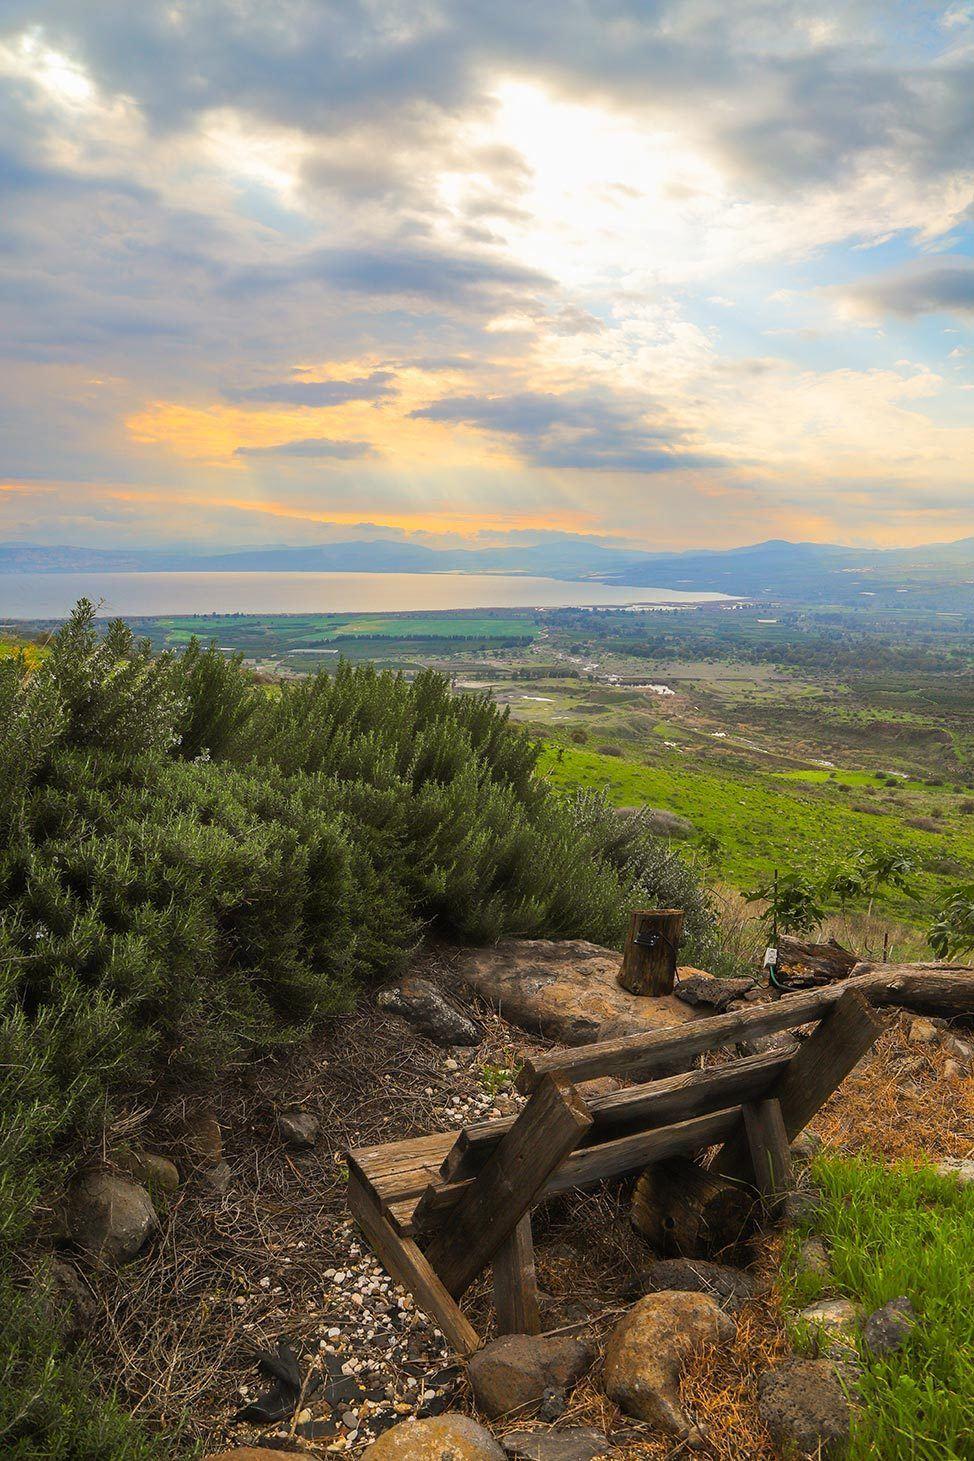 Sunset at Lake Galilee